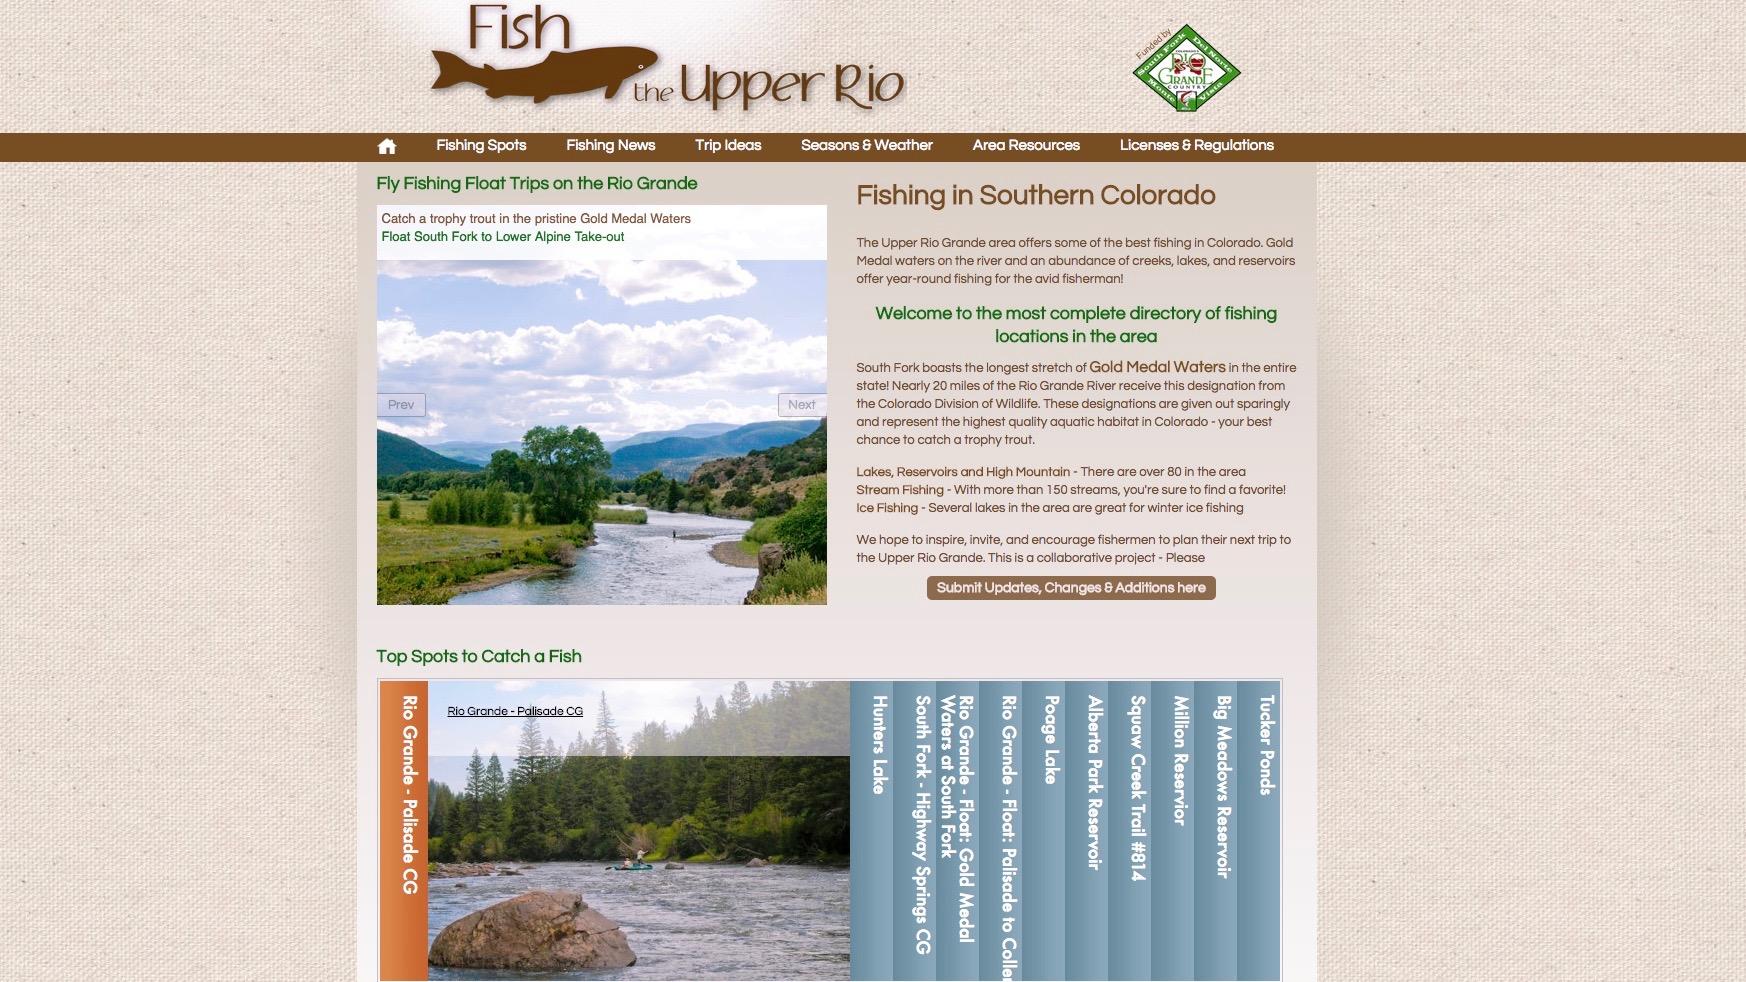 The Upper Rio Grande Fishing website